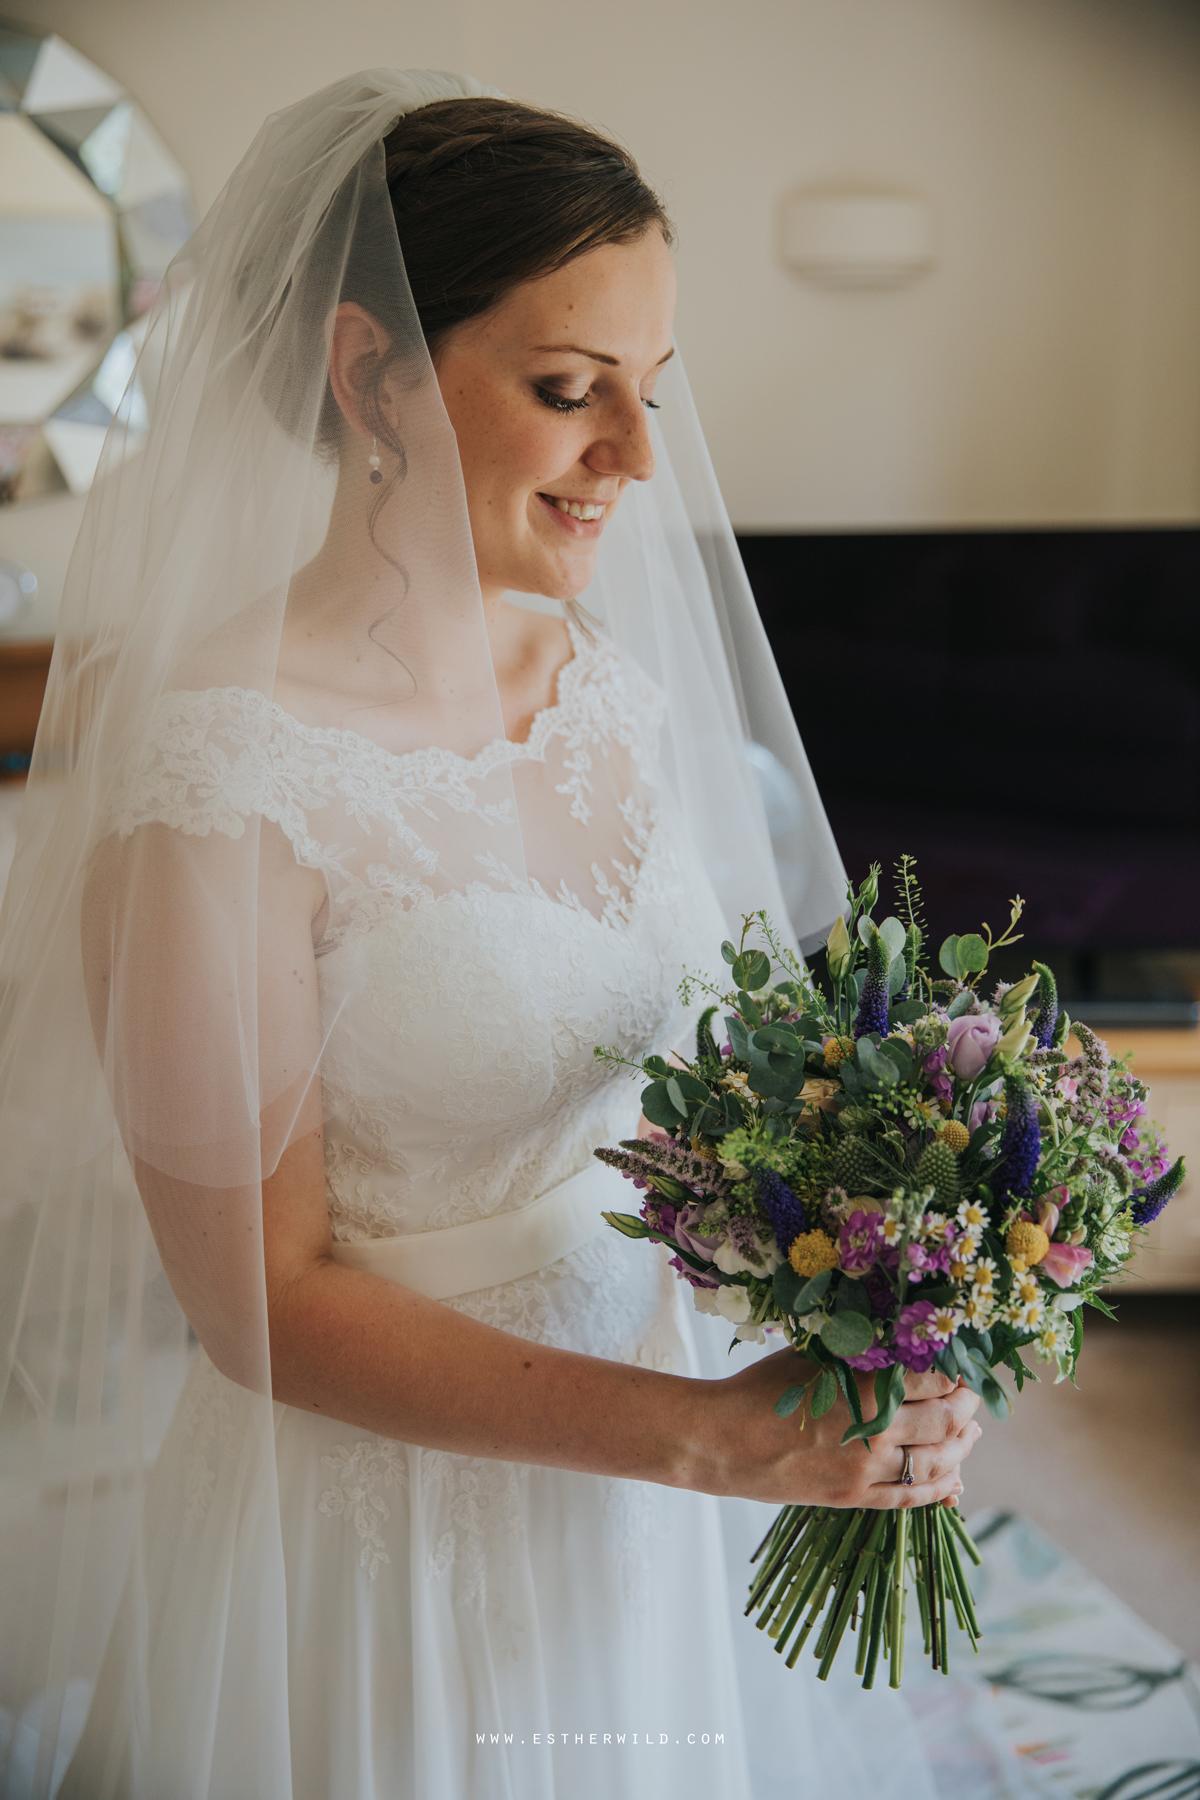 The_Georgian_Townhouse_Wedding_Norwich_Esther_Wild_Photographer_3R8A0589.jpg